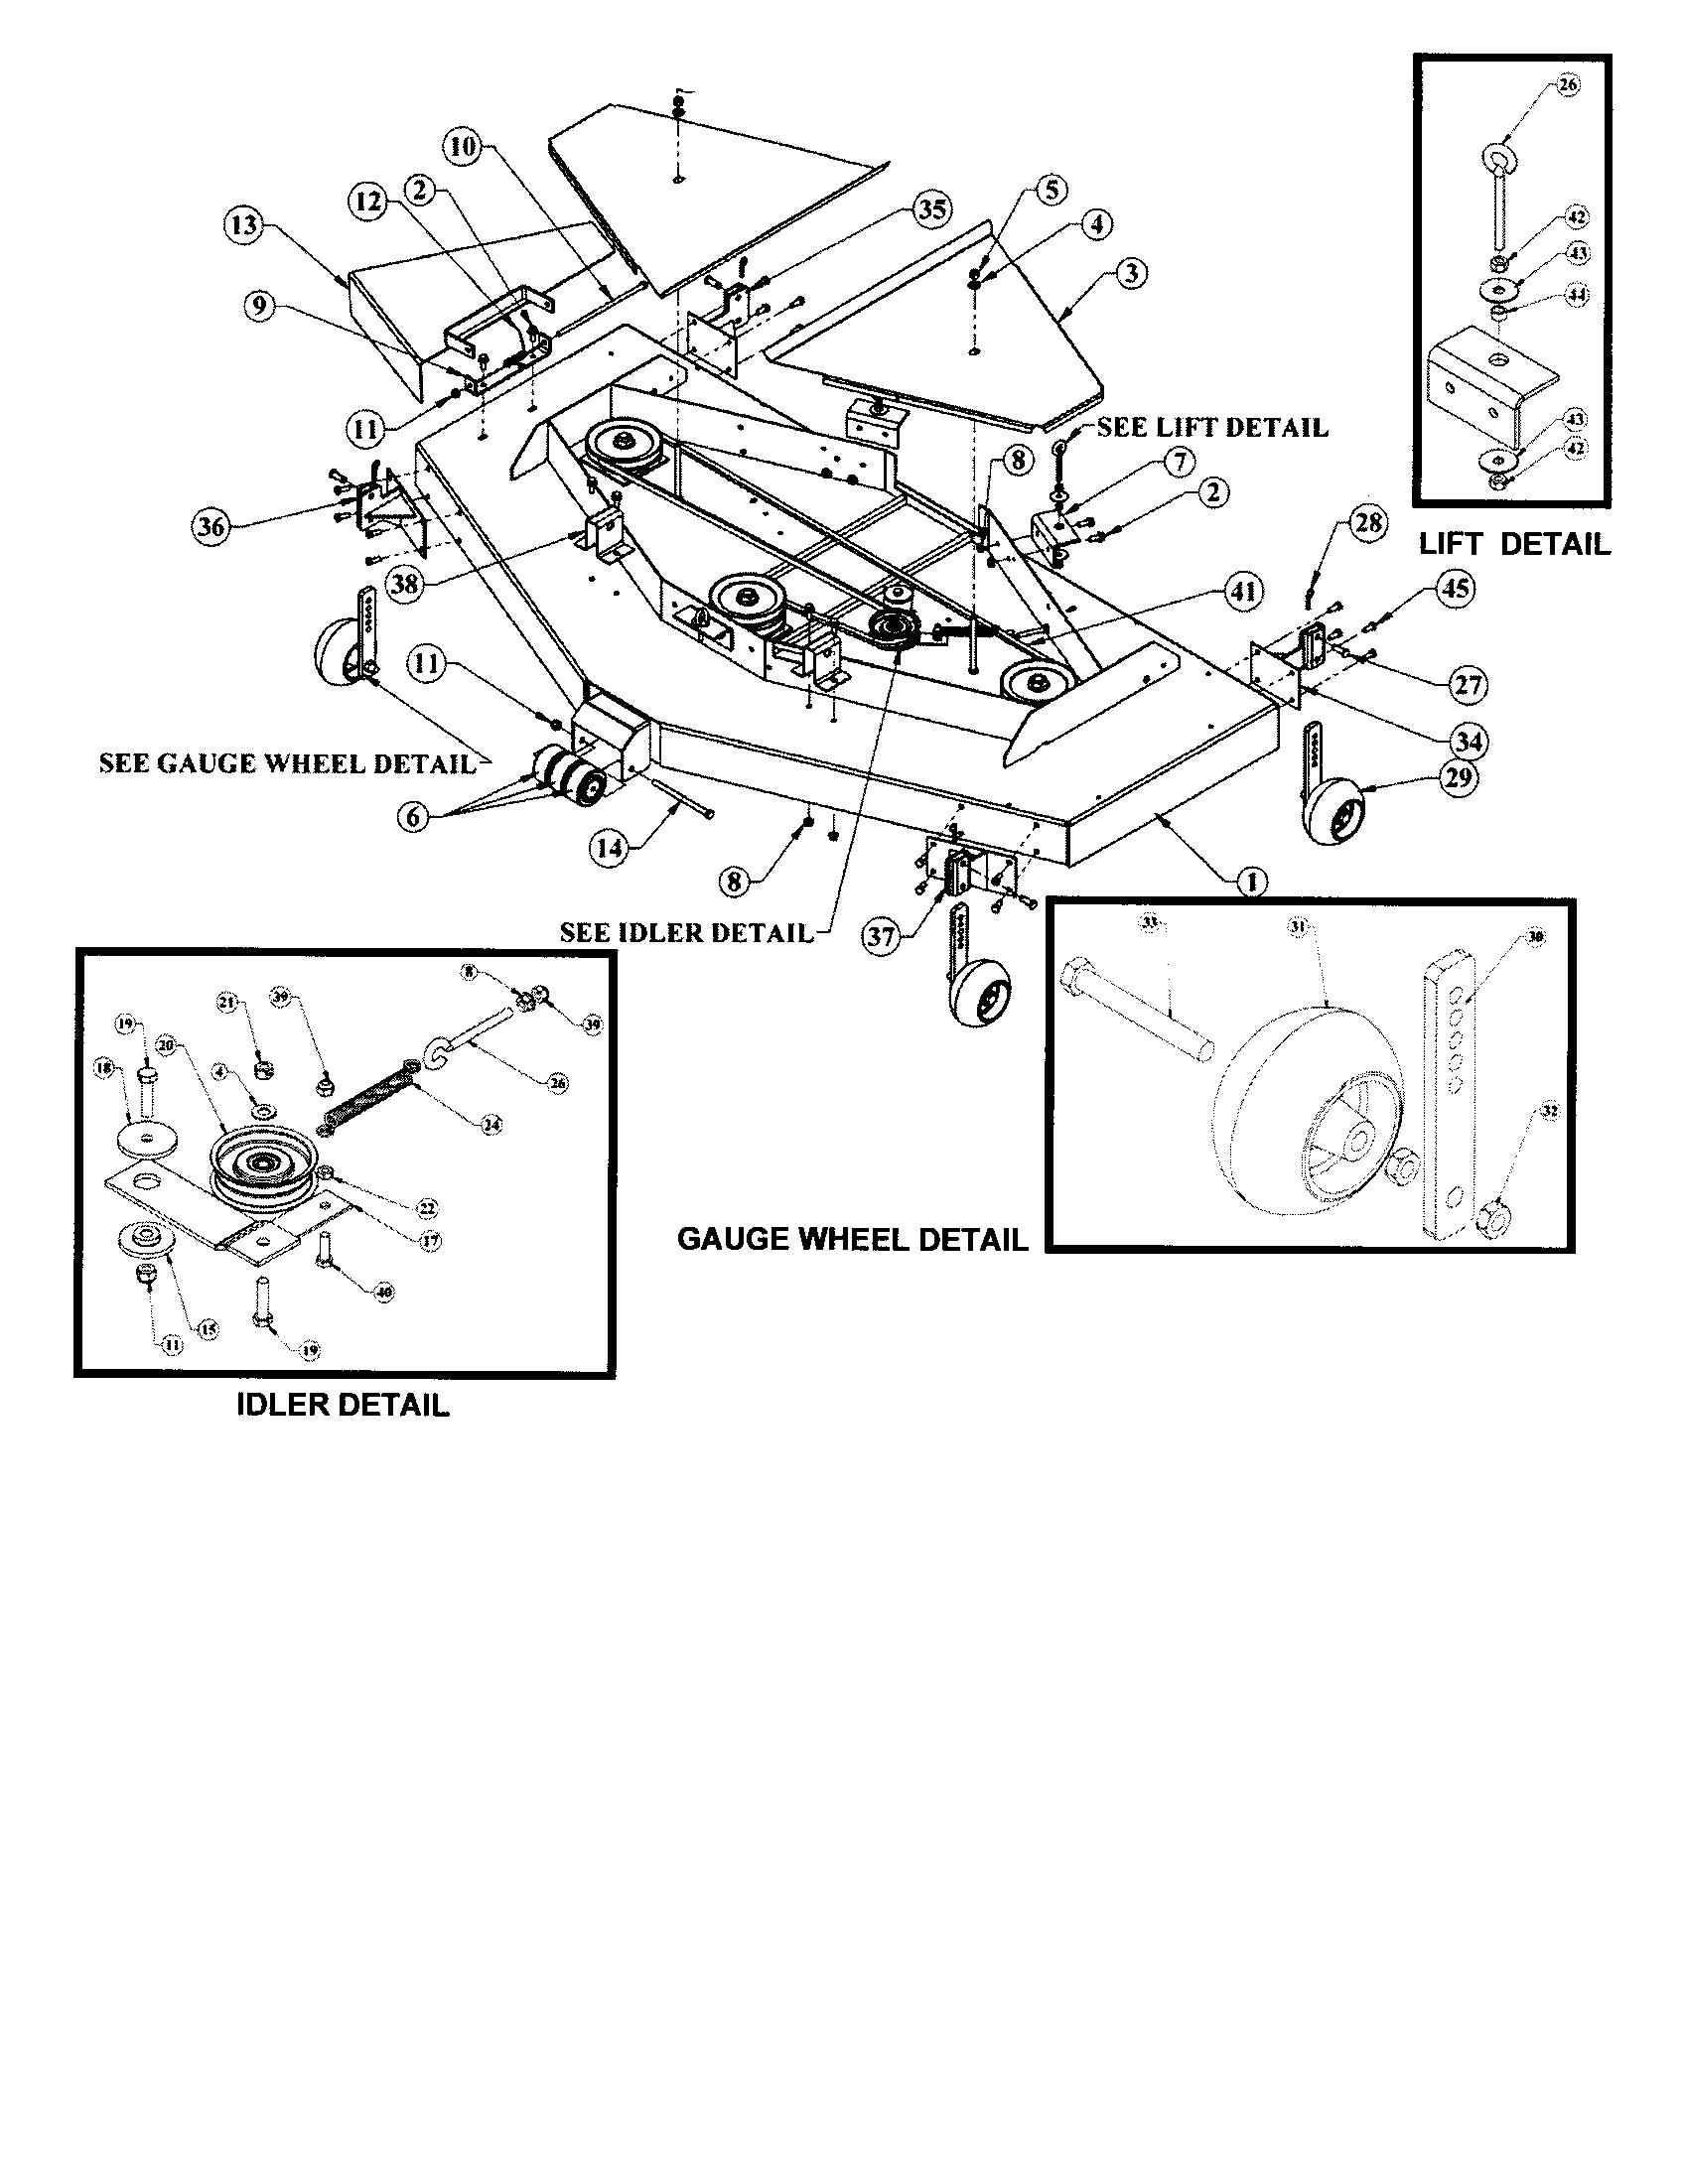 Swisher Ignition Wiring Diagram